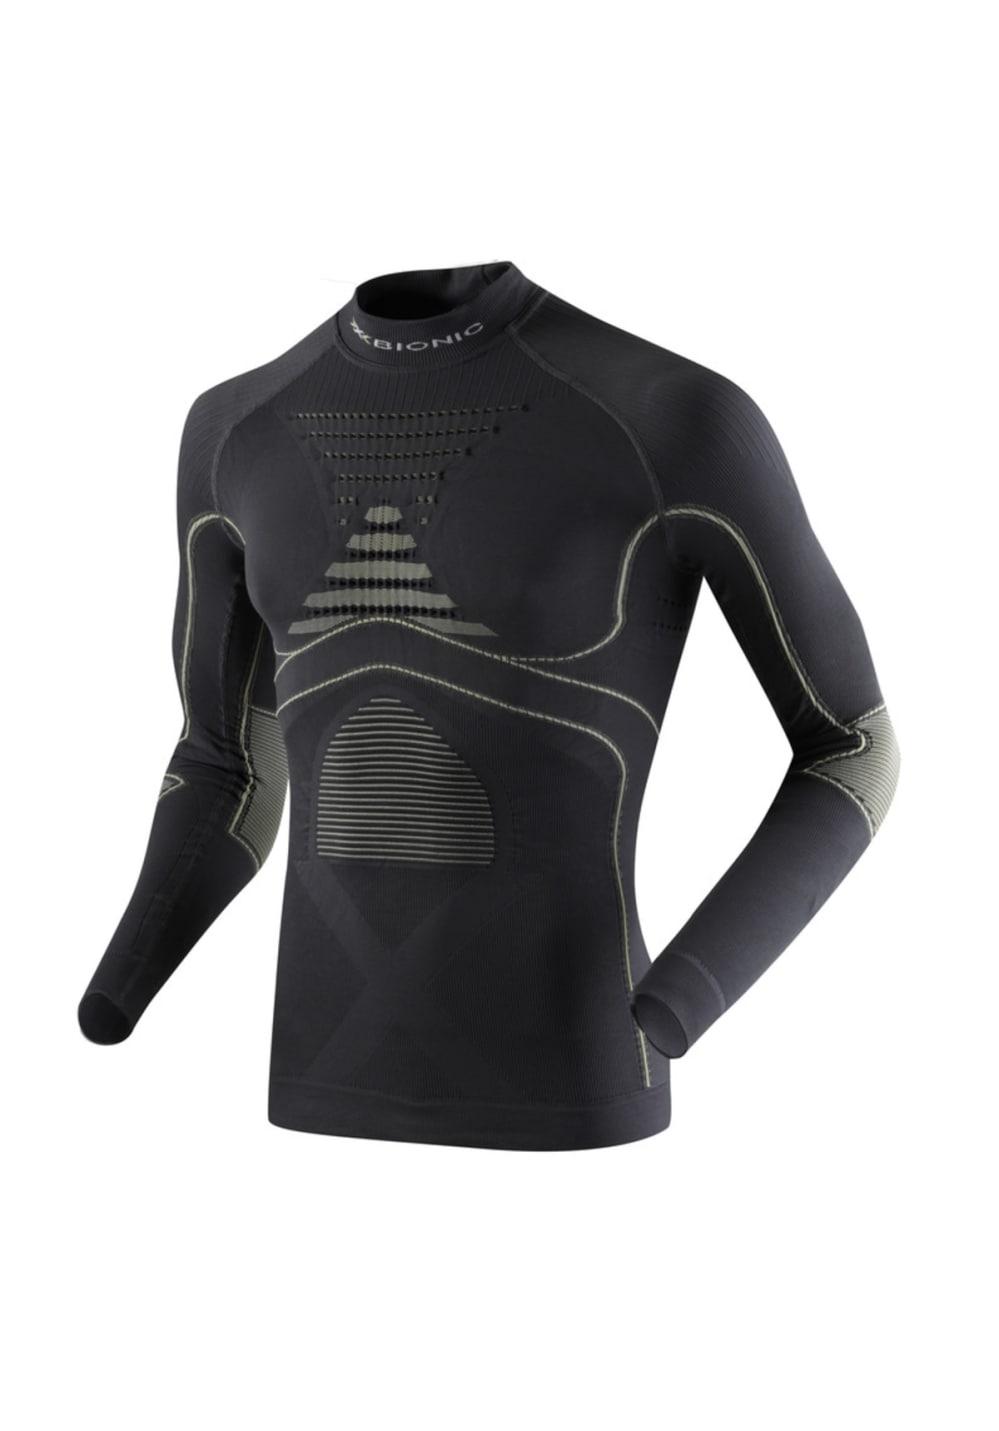 X-Bionic Energy Accumulator Shirt Long Sleeve Turtle Neck - Funktionsunterwäsch